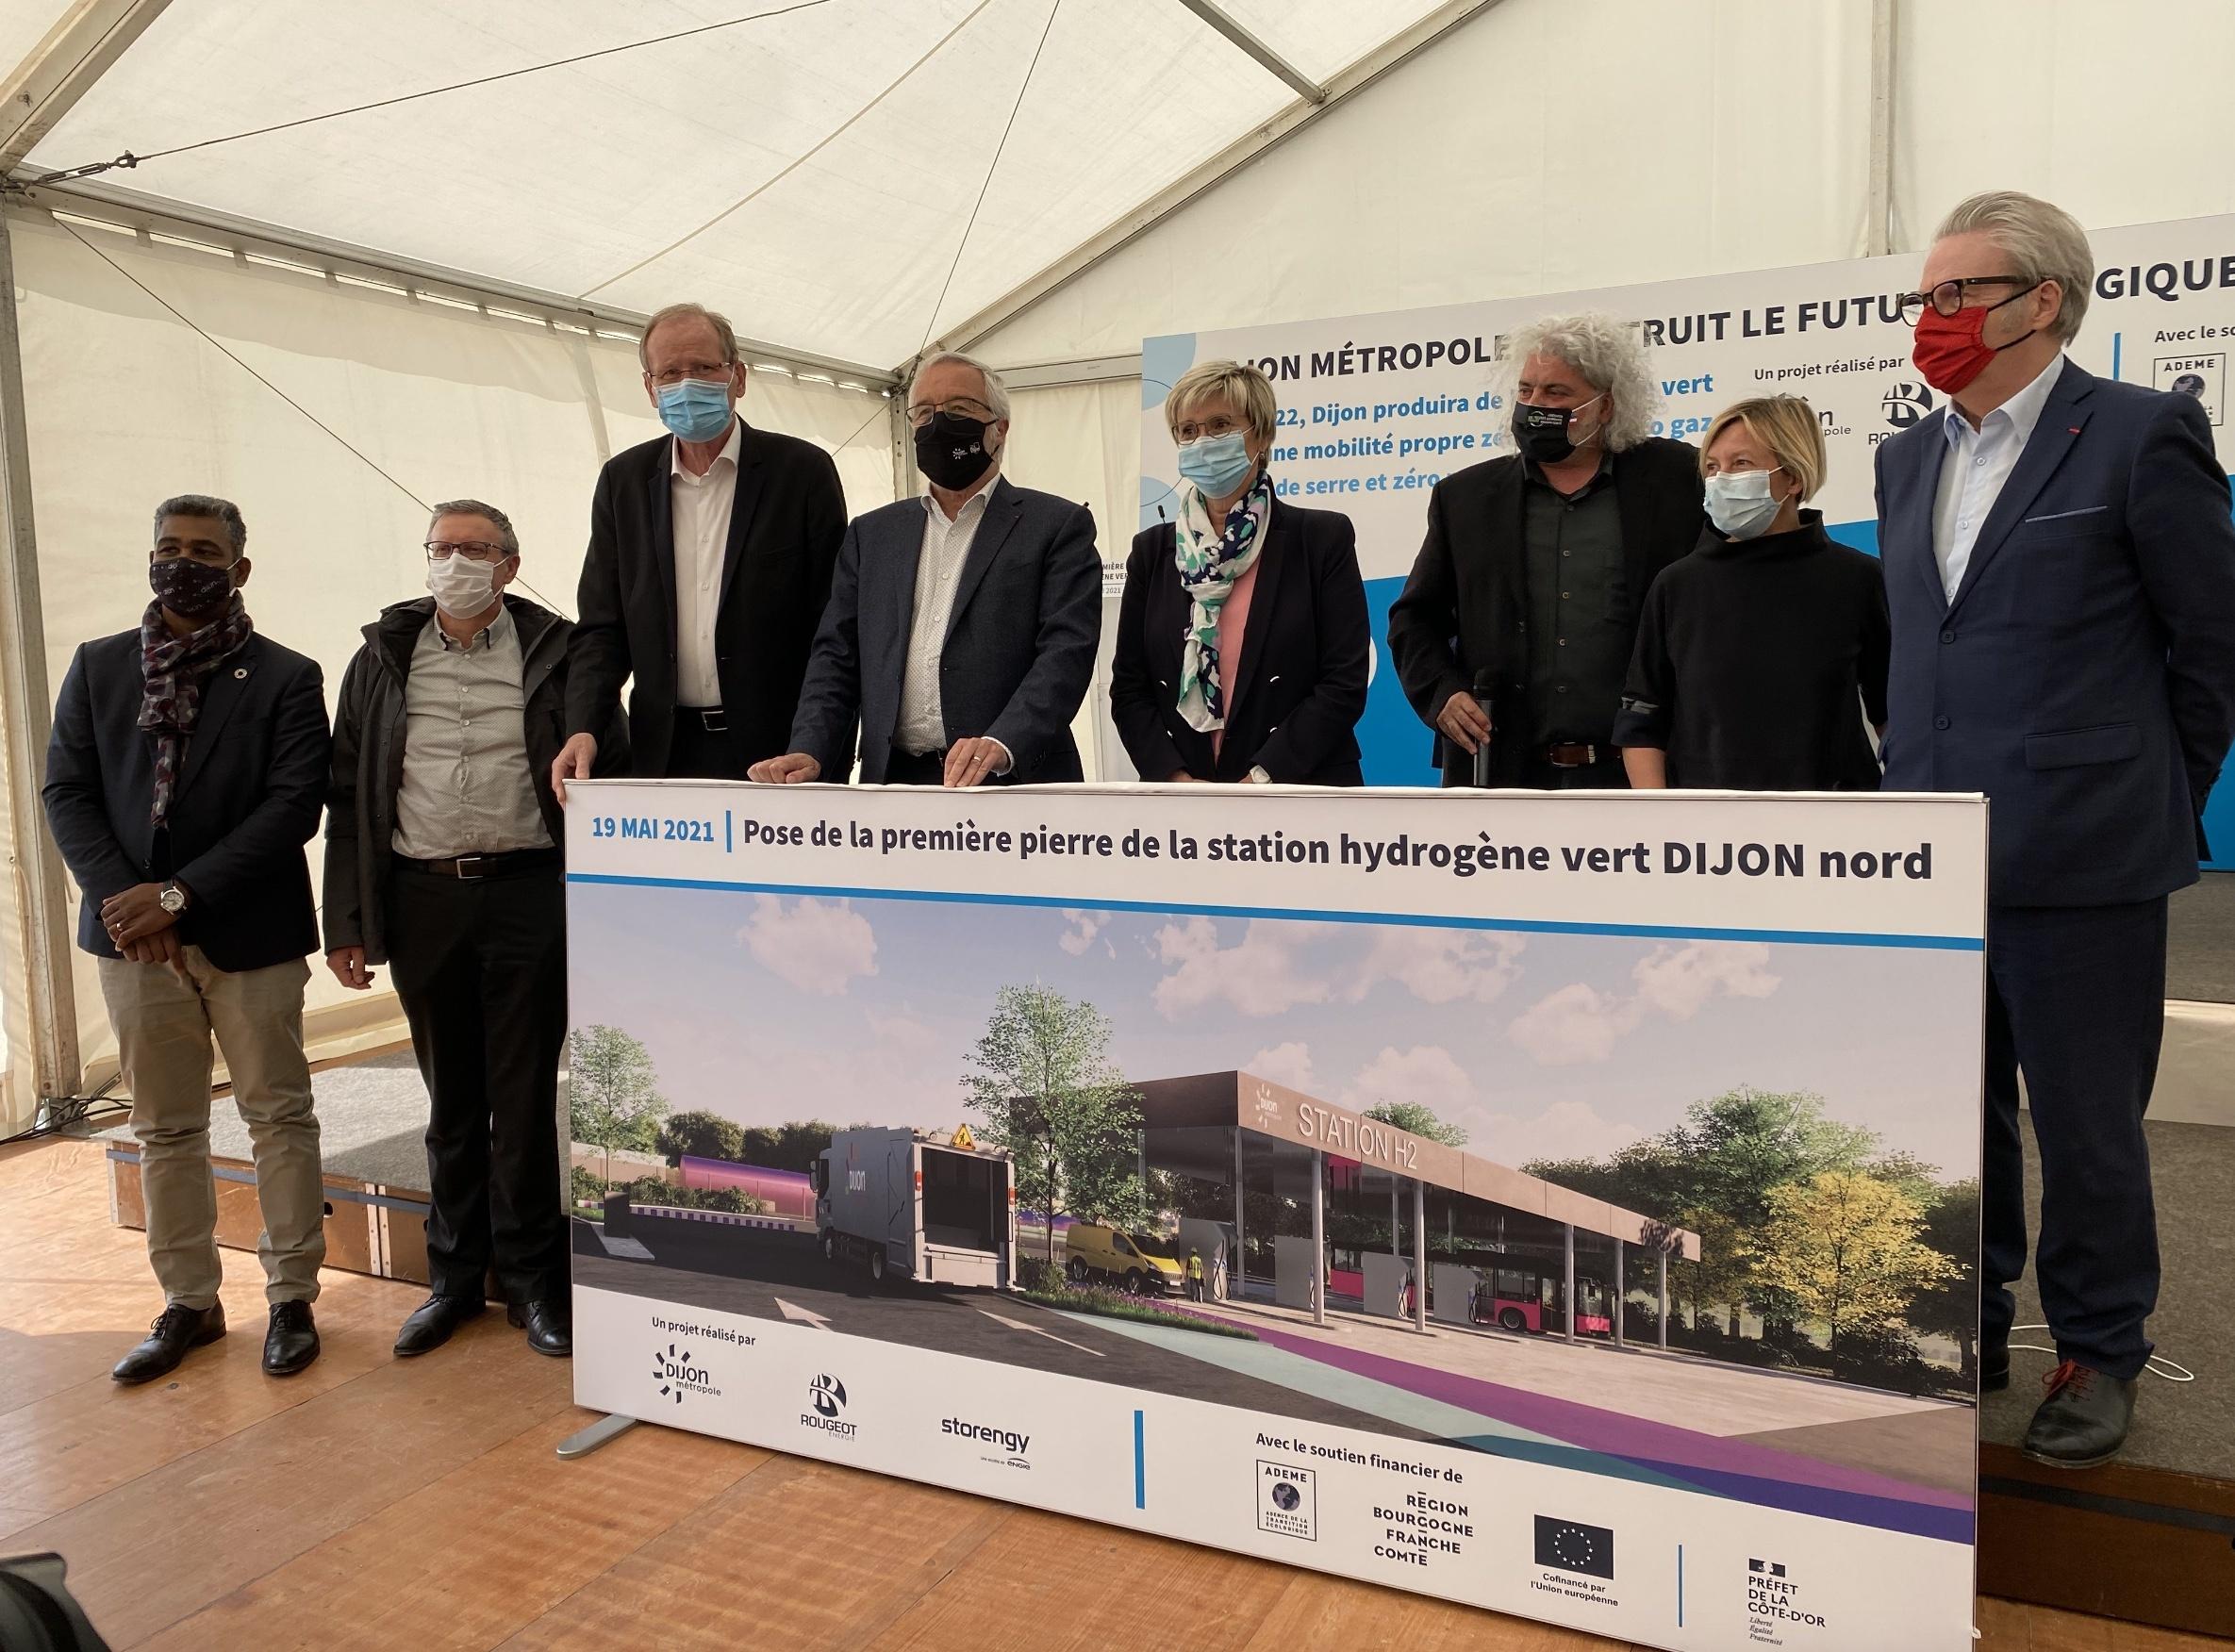 Dijon Métropole inaugure son grand projet hydrogène